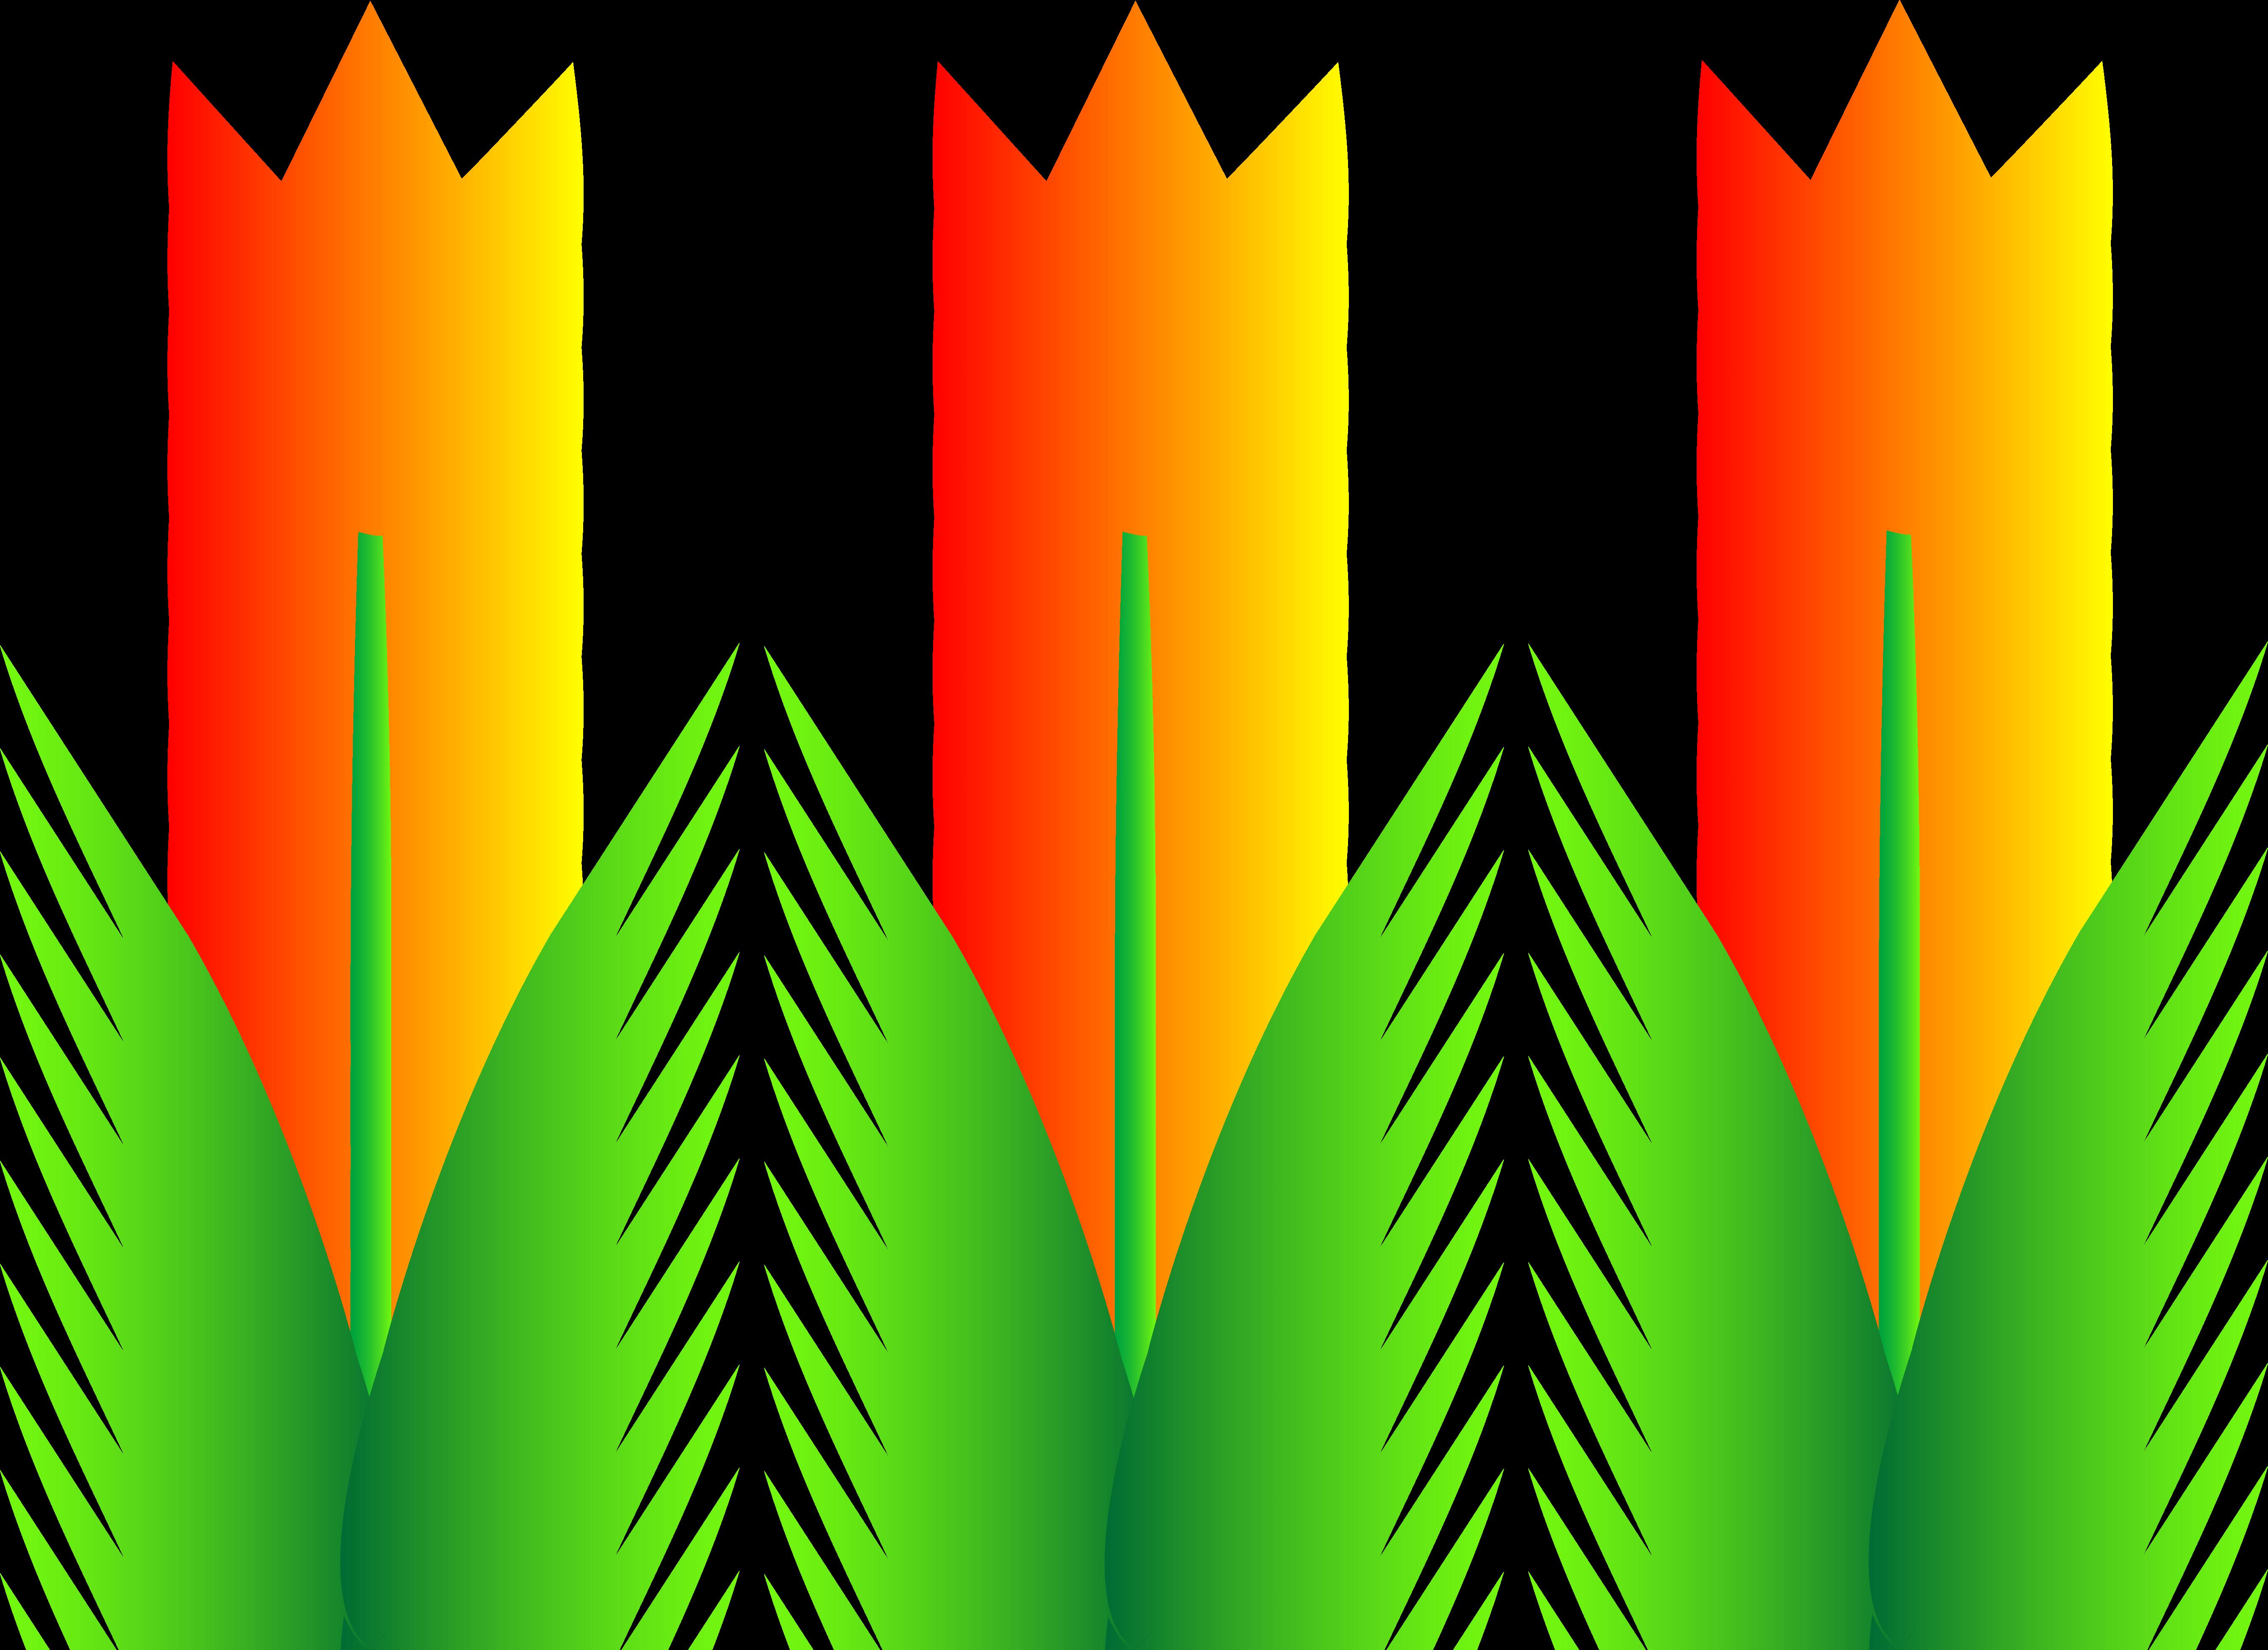 free clipart images u0026middot; Tulip Clip Art